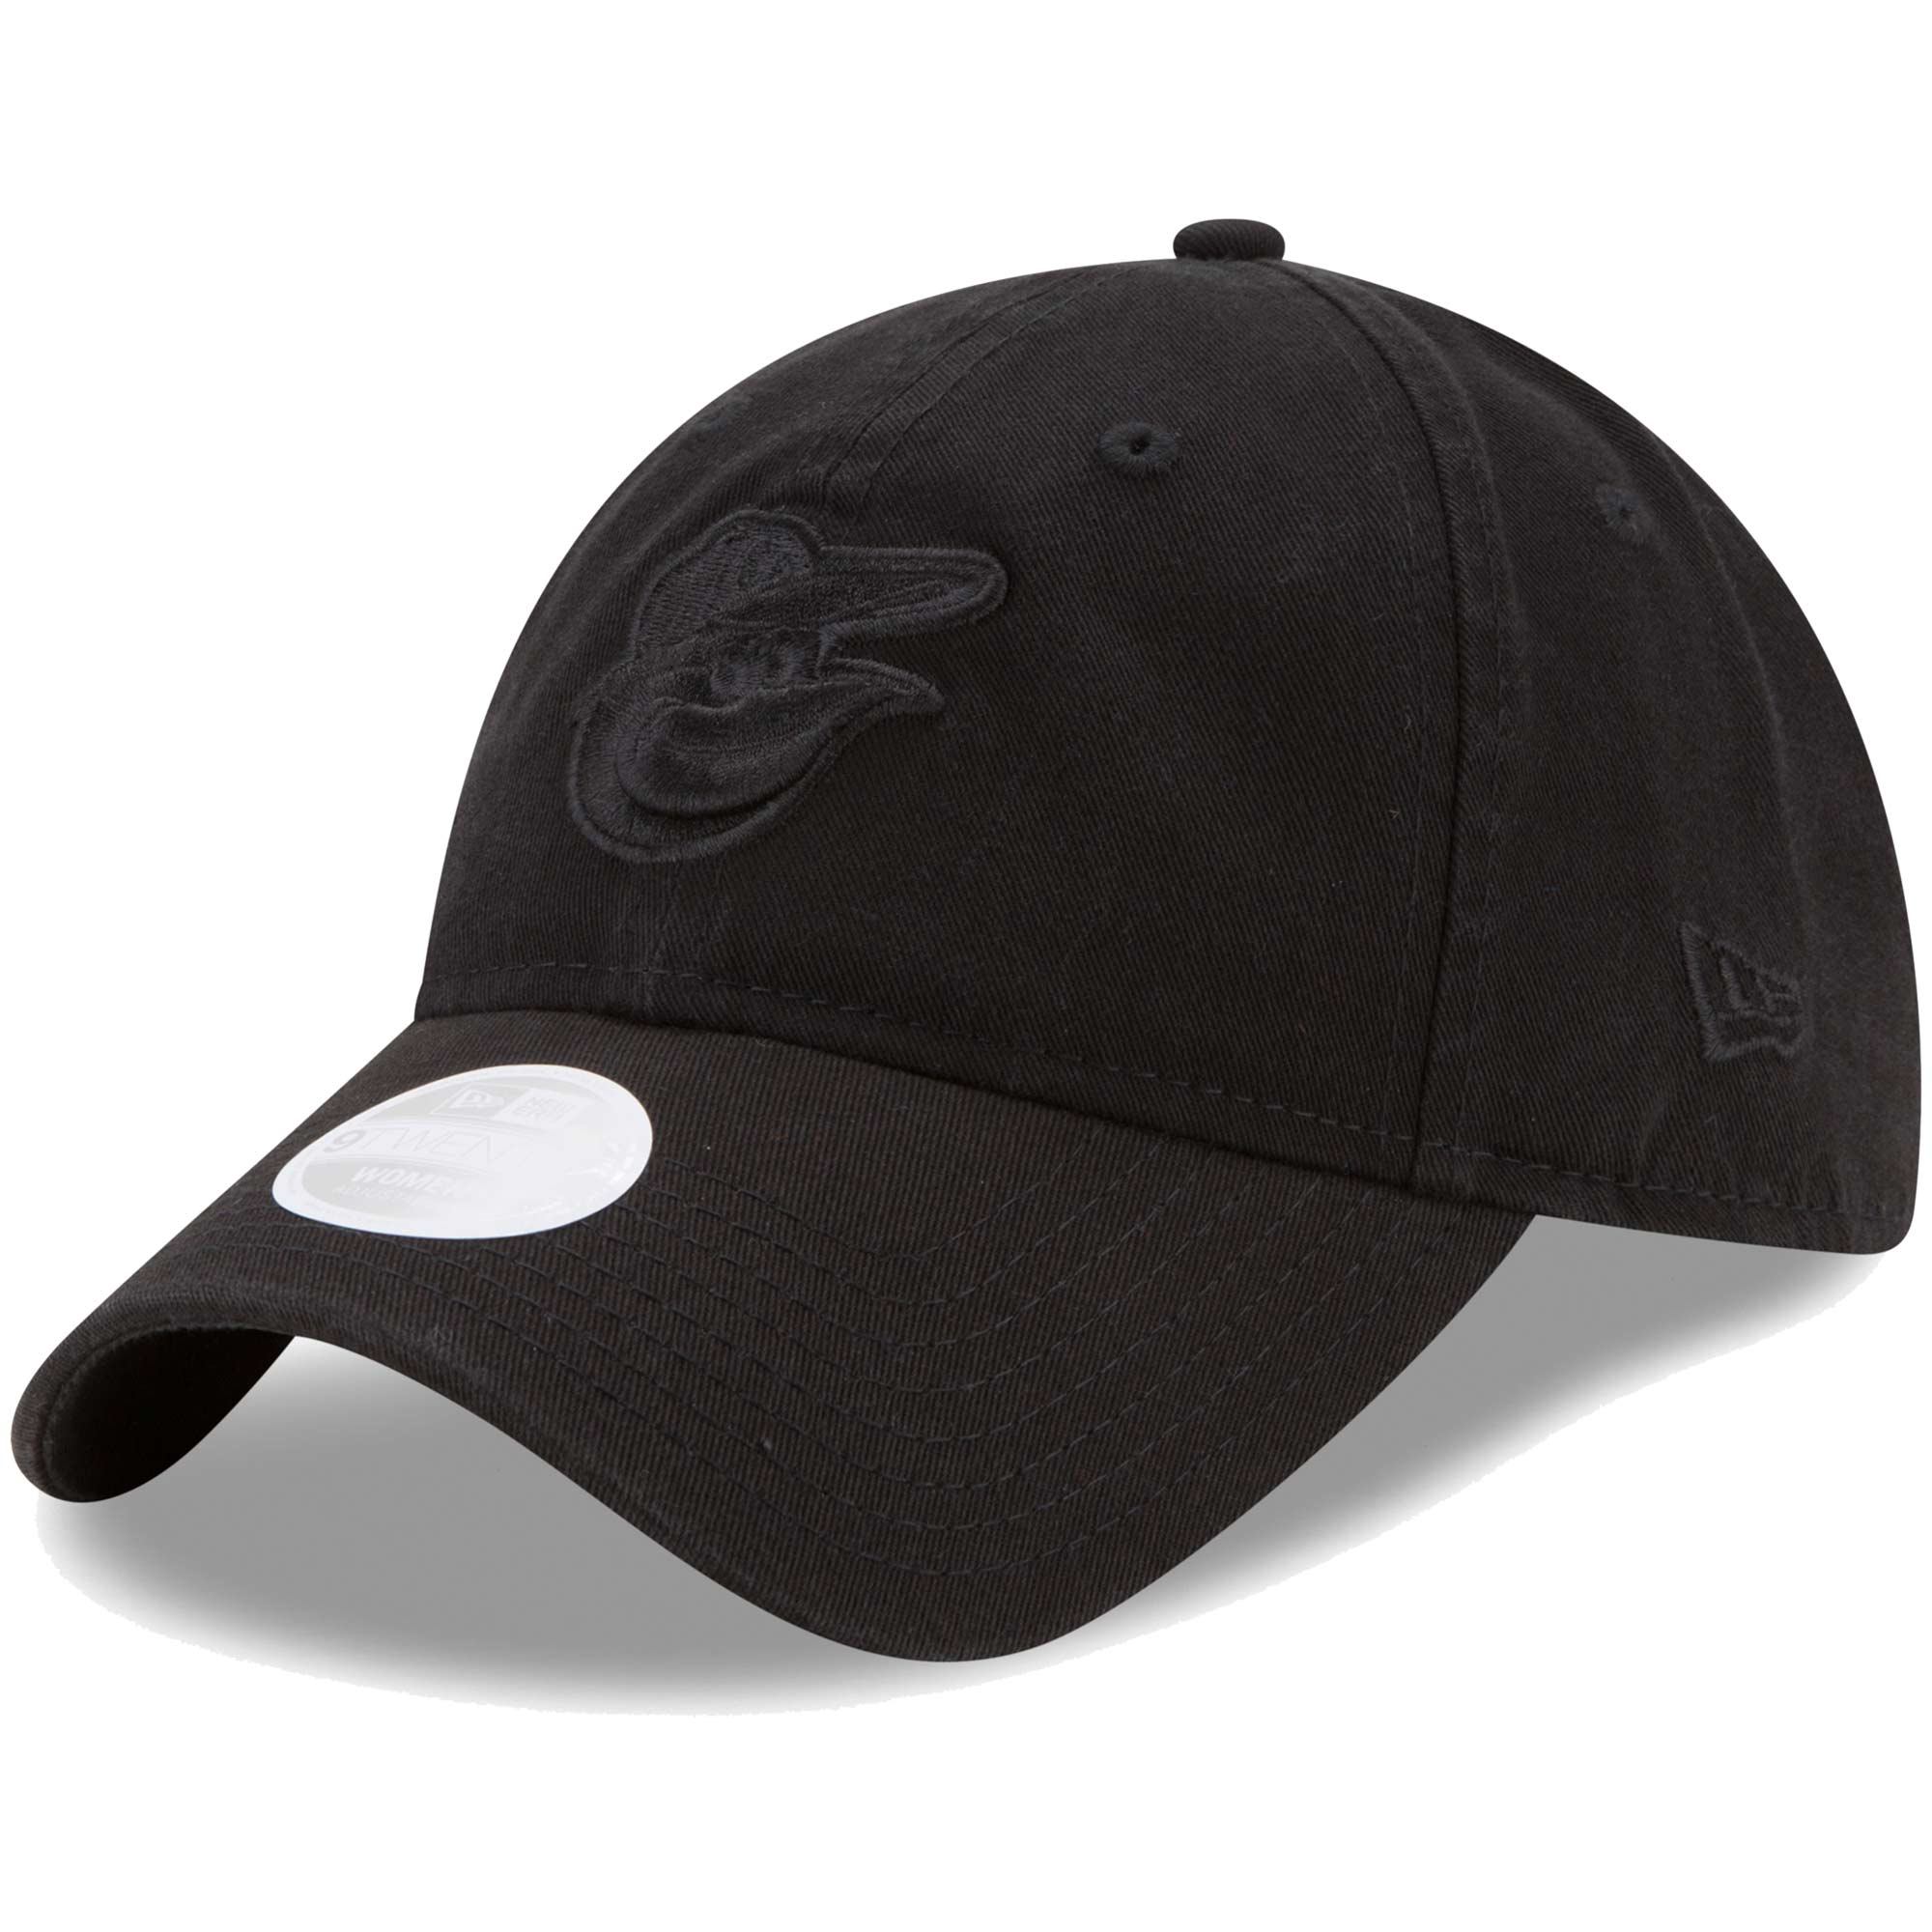 Baltimore Orioles New Era Women's Preferred Pick Tonal 9TWENTY Adjustable Hat - Black - OSFA